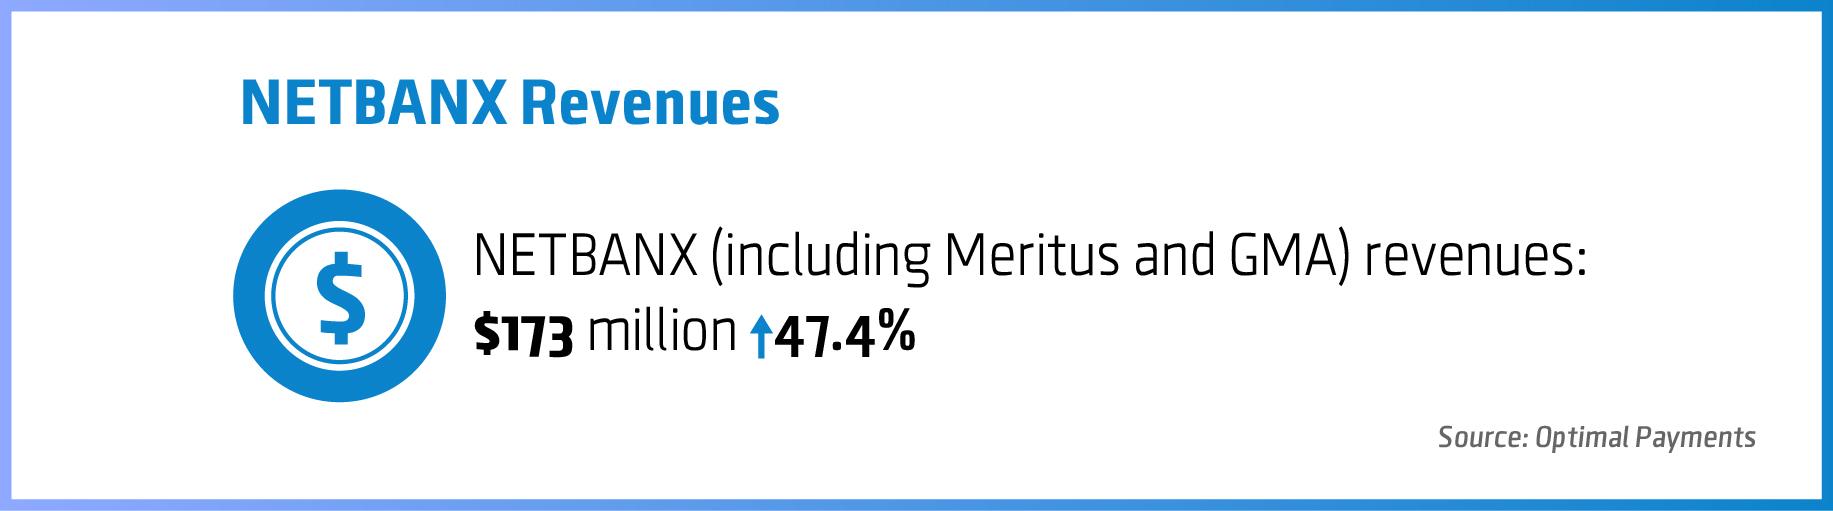 Netbanks-revenues-02